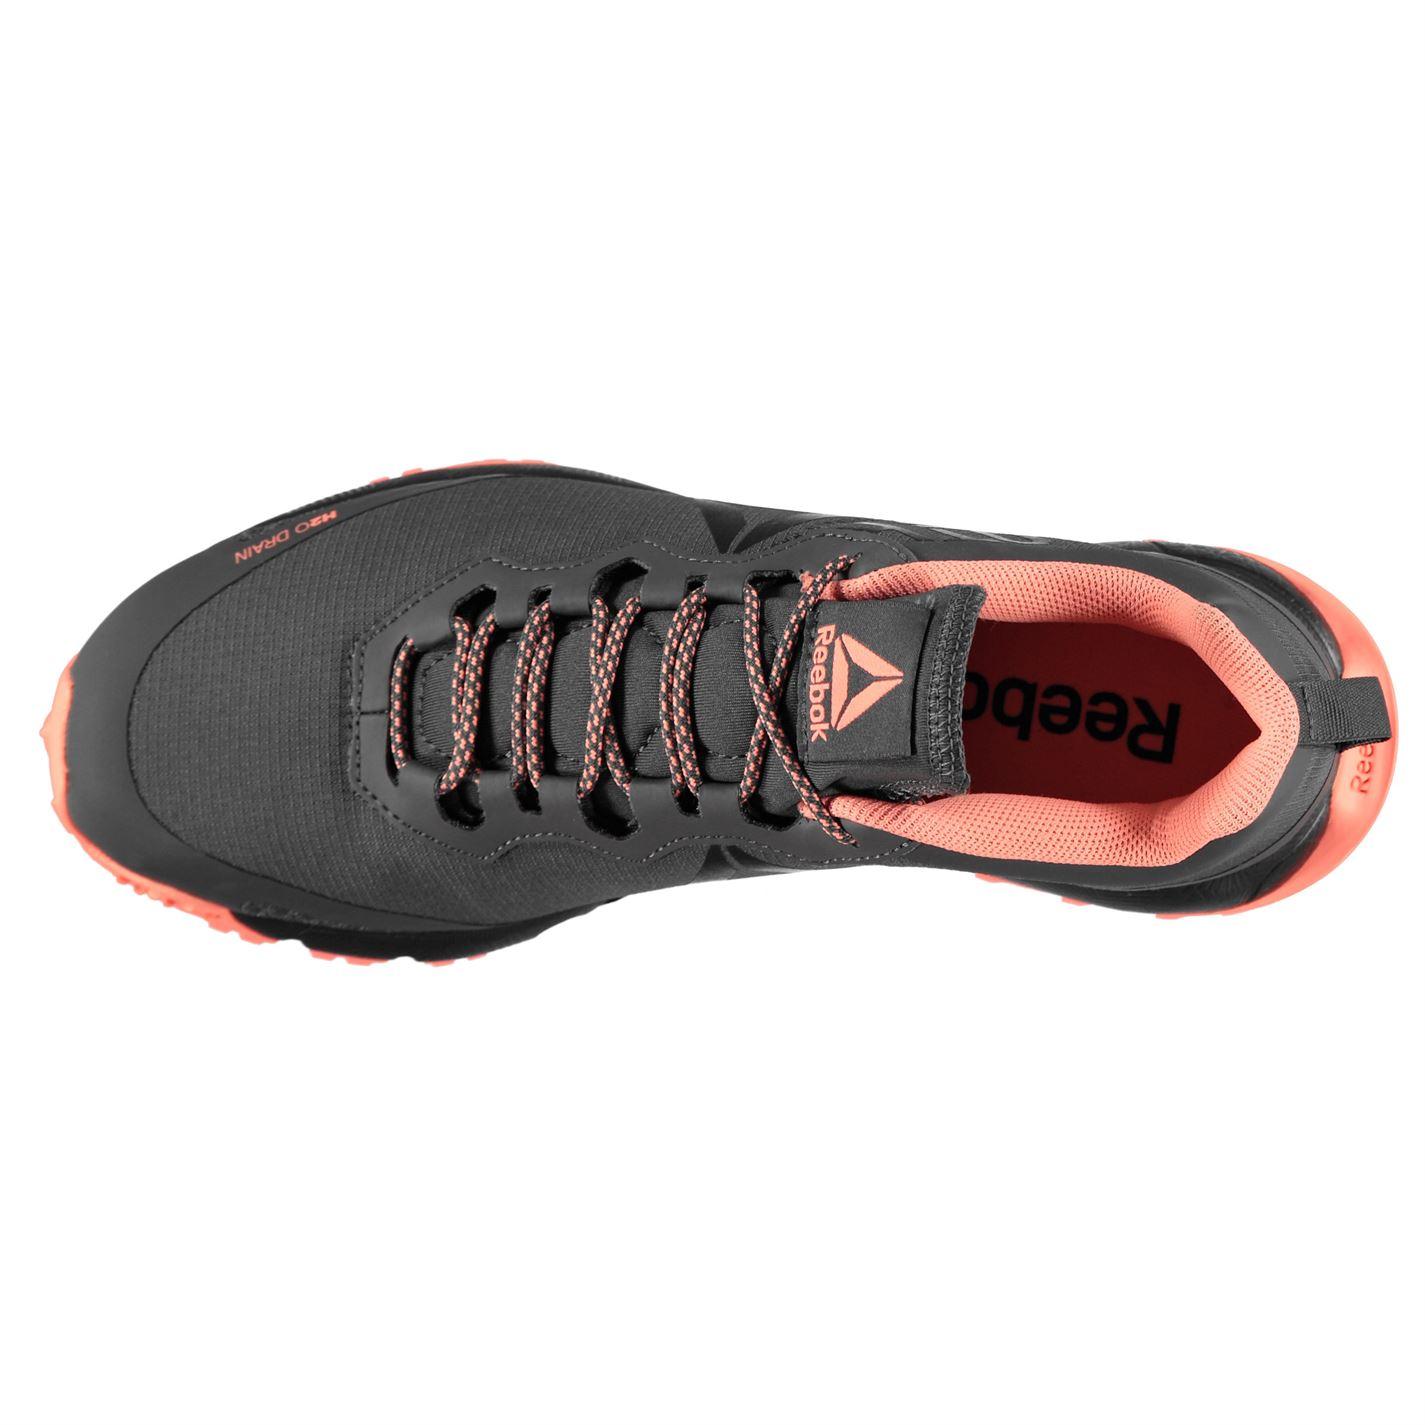 0dd4425989d Reebok-All-Terrain-Craze-Running-Shoes-Trail-Womens thumbnail